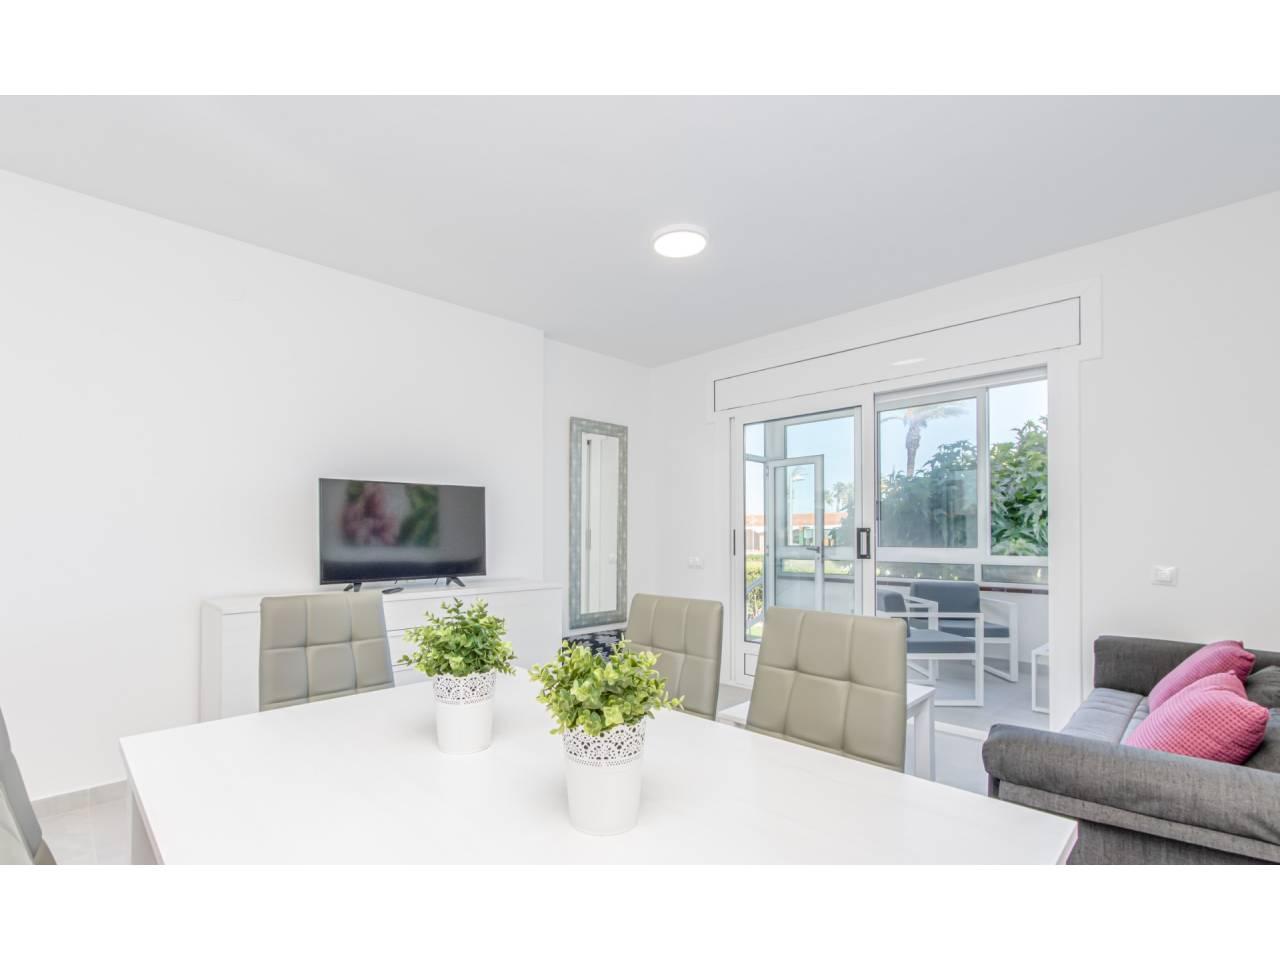 880025 - Apartment for short-term rental in Empuriabrava